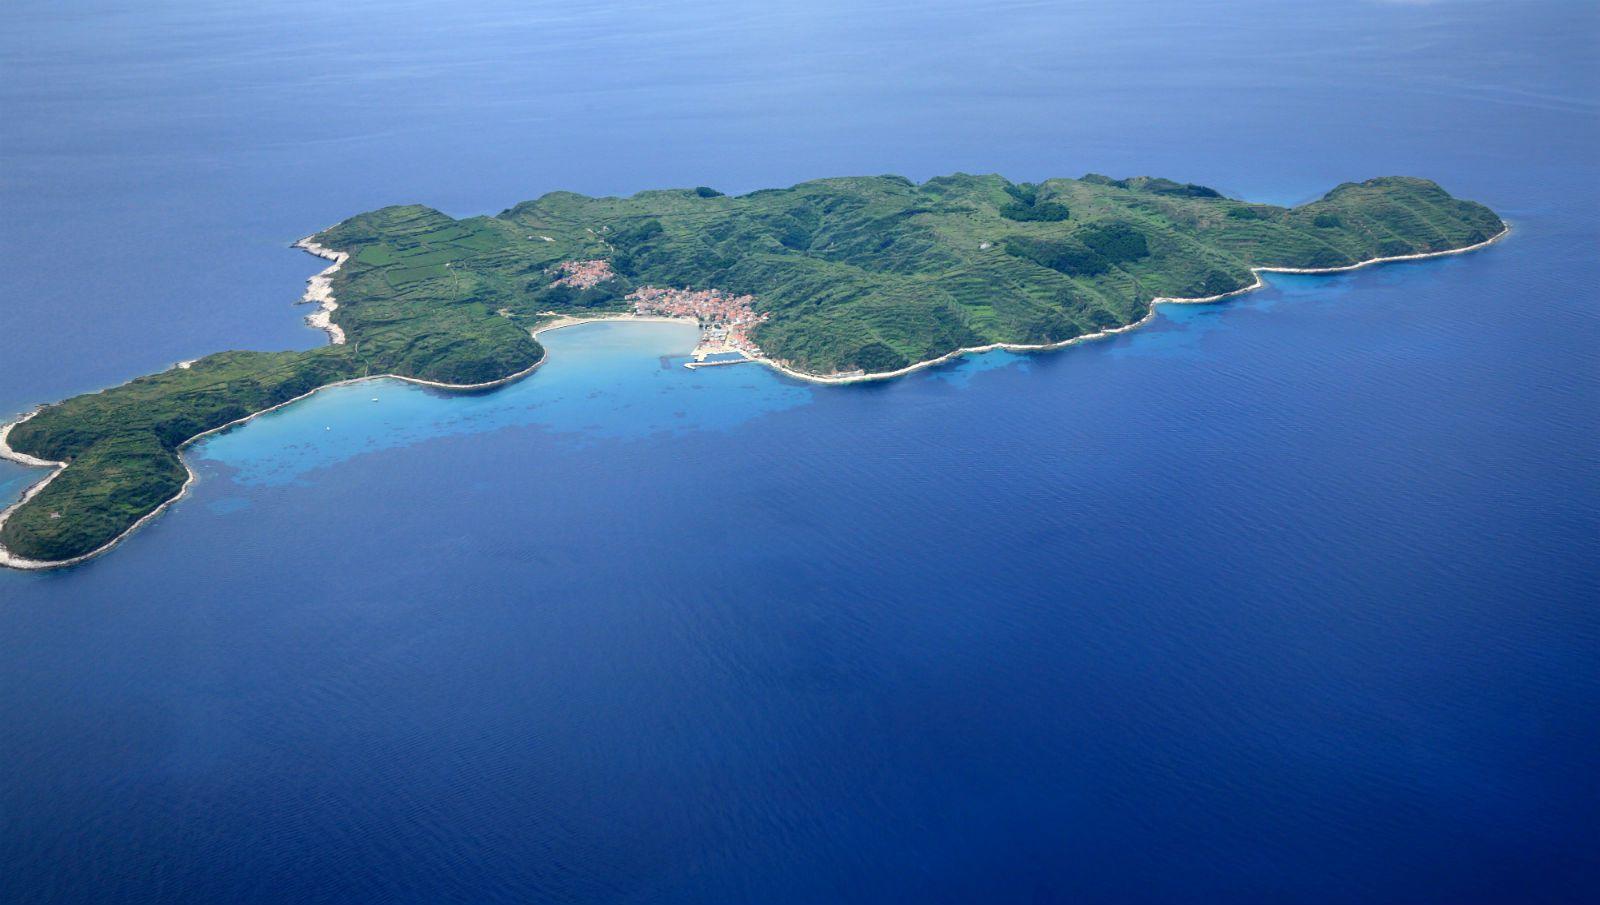 susak island